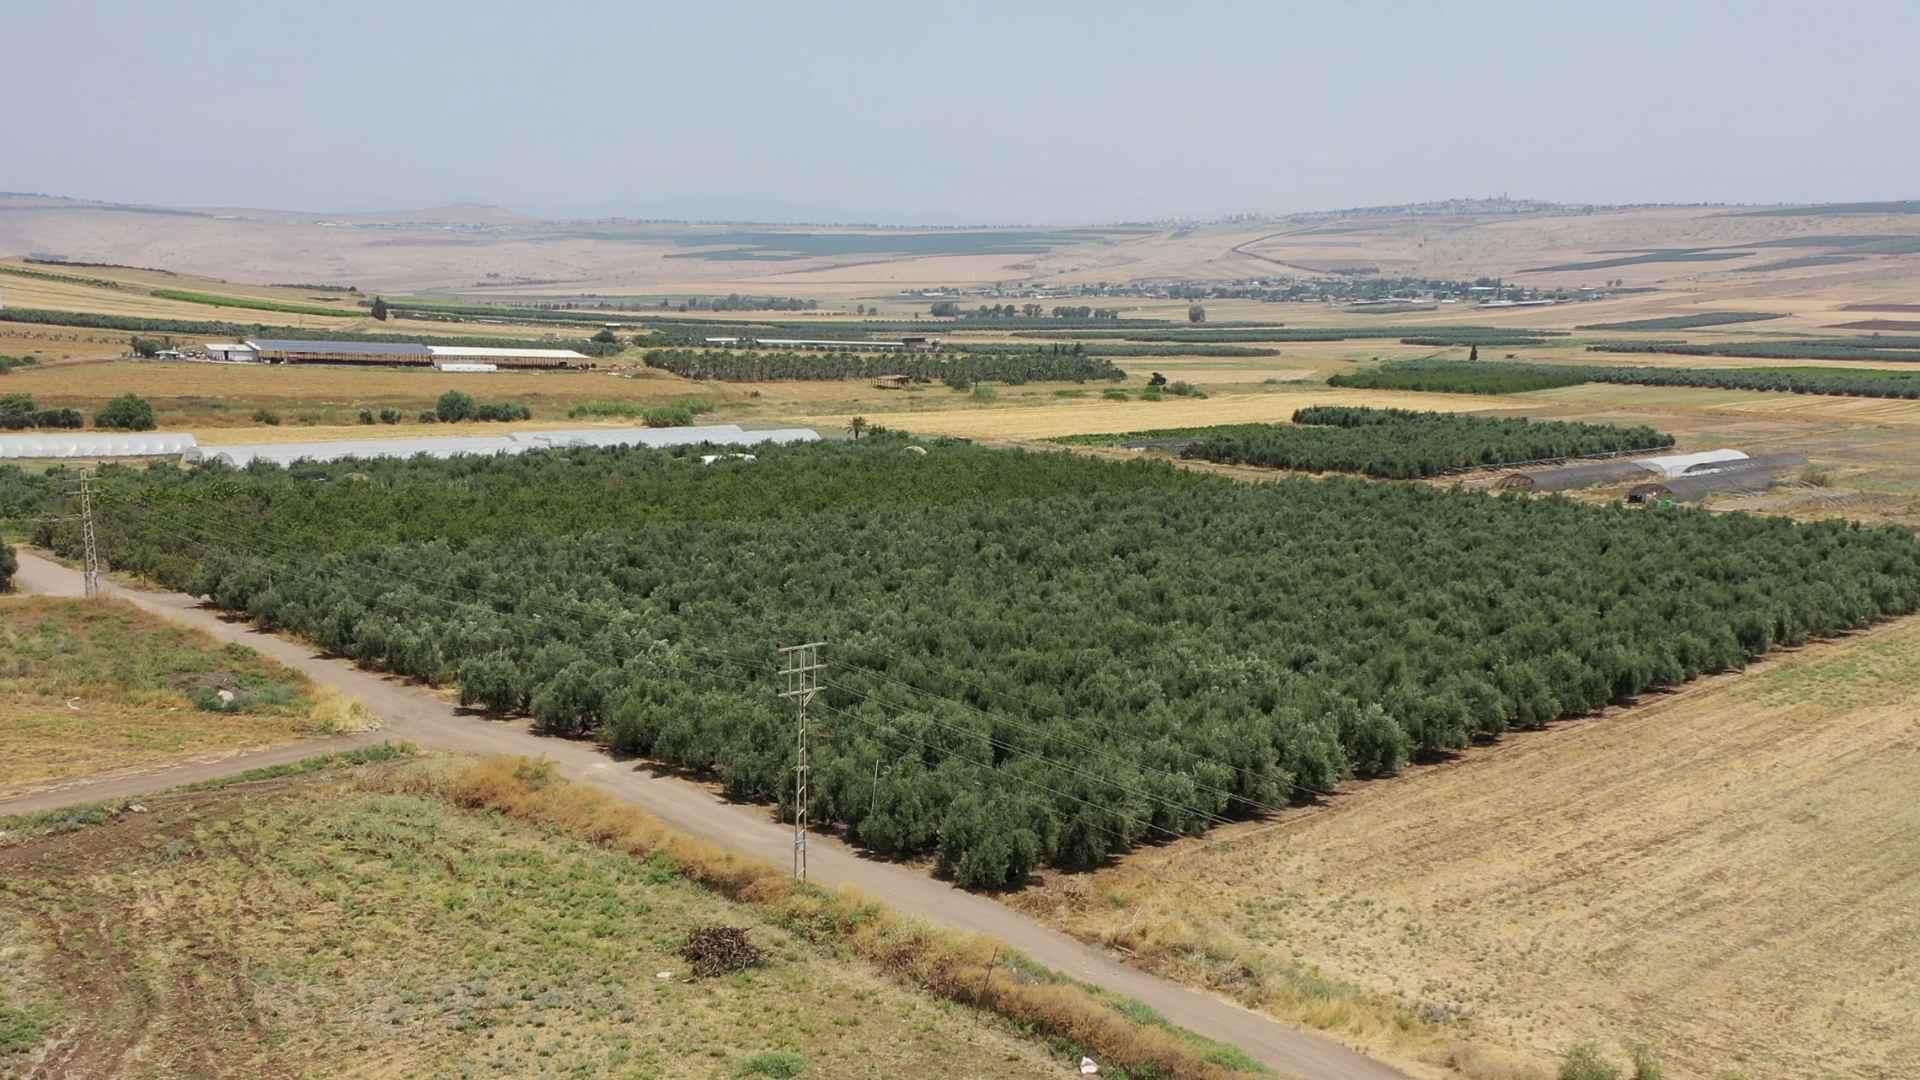 Real Estate in Israel